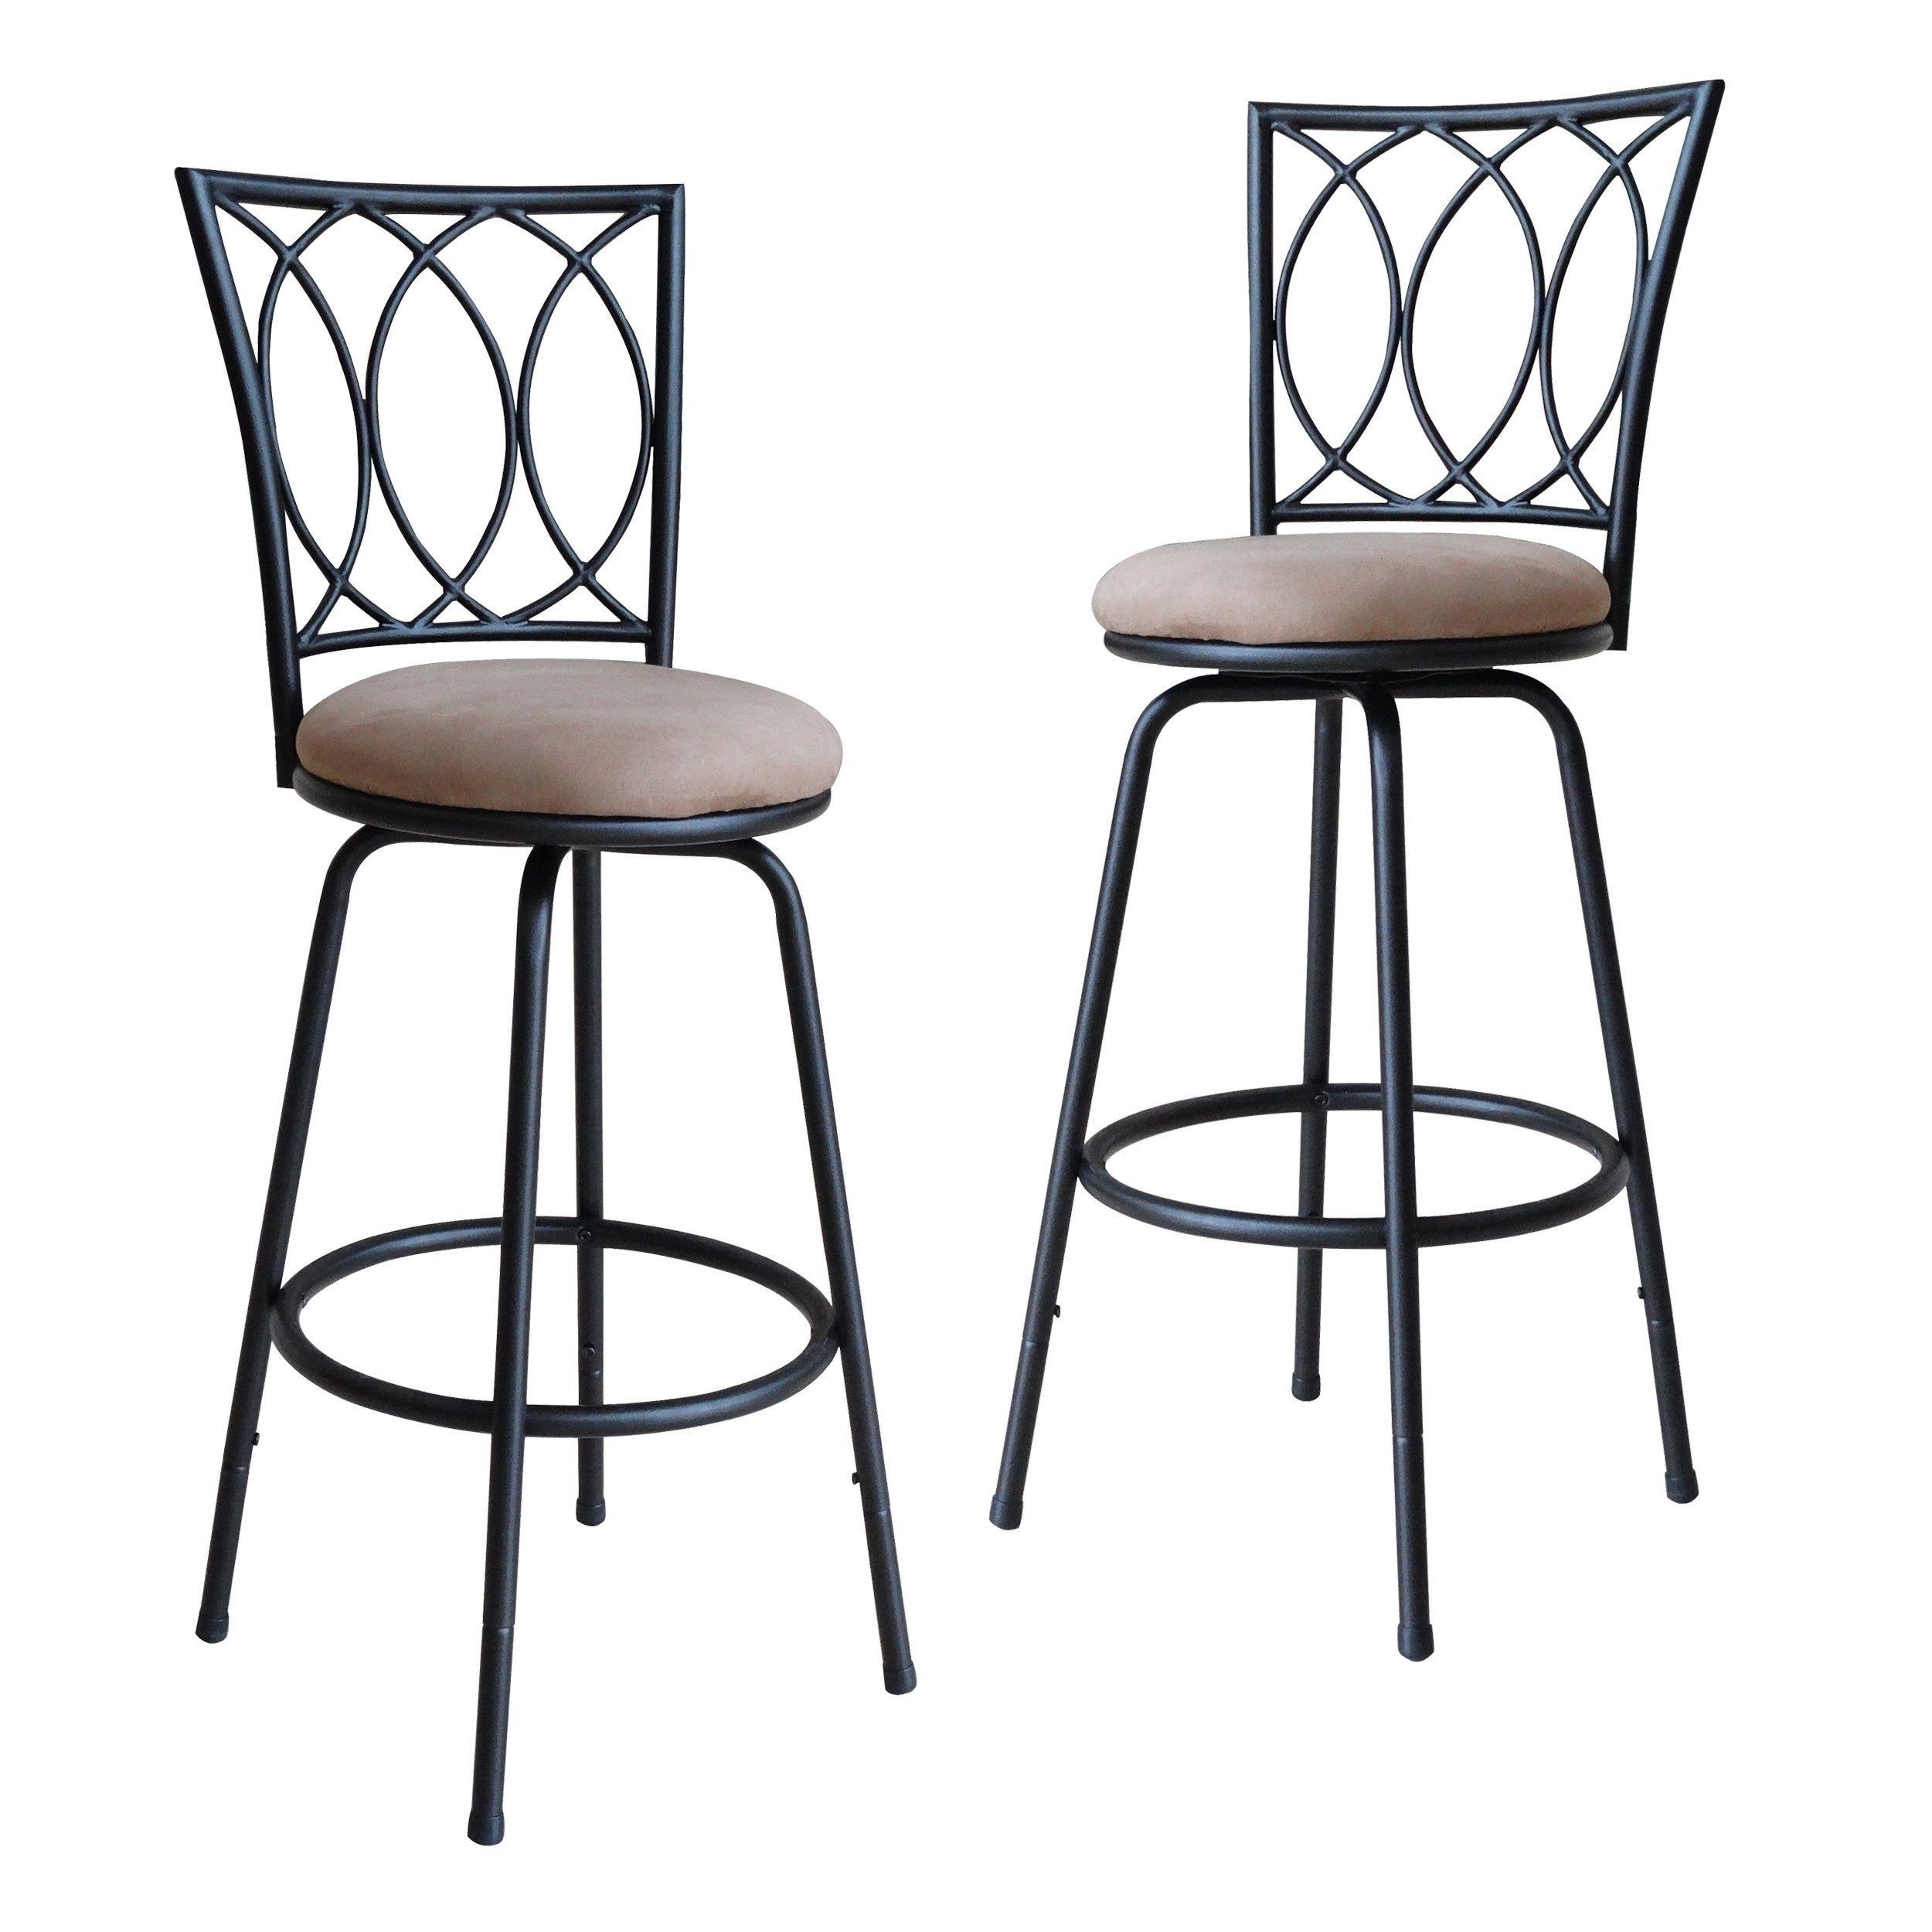 Swell Porch Den Folsom Adjustable Metal Bar Stool In Brown Cjindustries Chair Design For Home Cjindustriesco